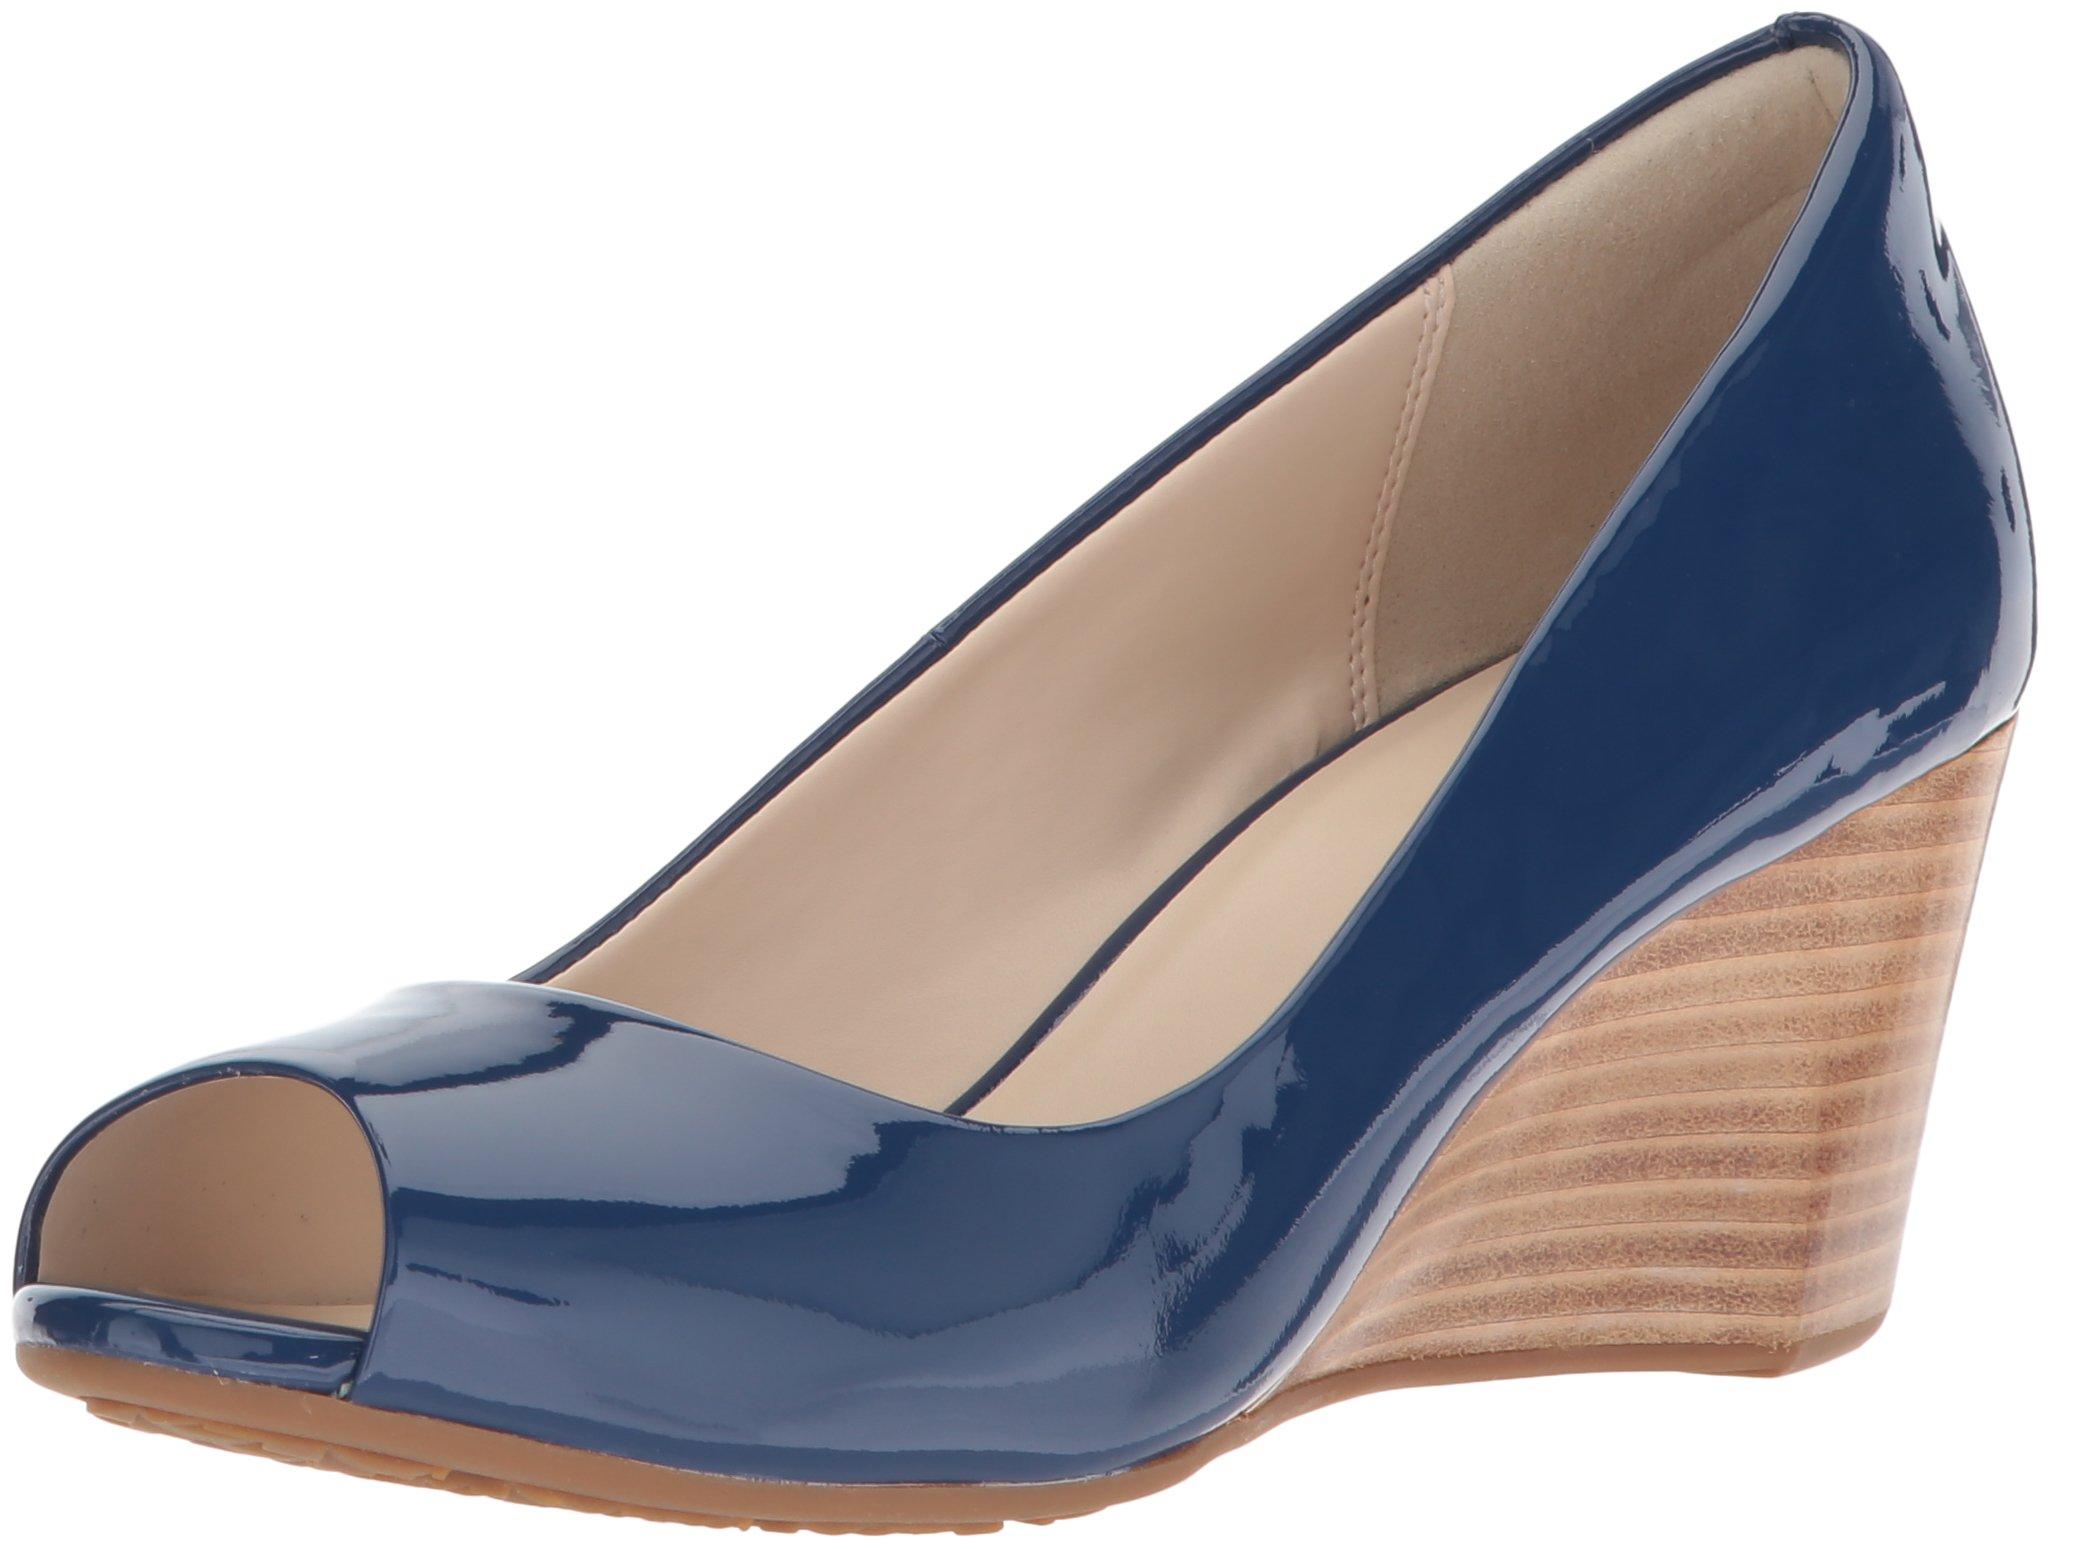 Cole Haan Women's Sadie Open Toe Wedge 65MM Pump, Navy Peony Patent, 5 B US